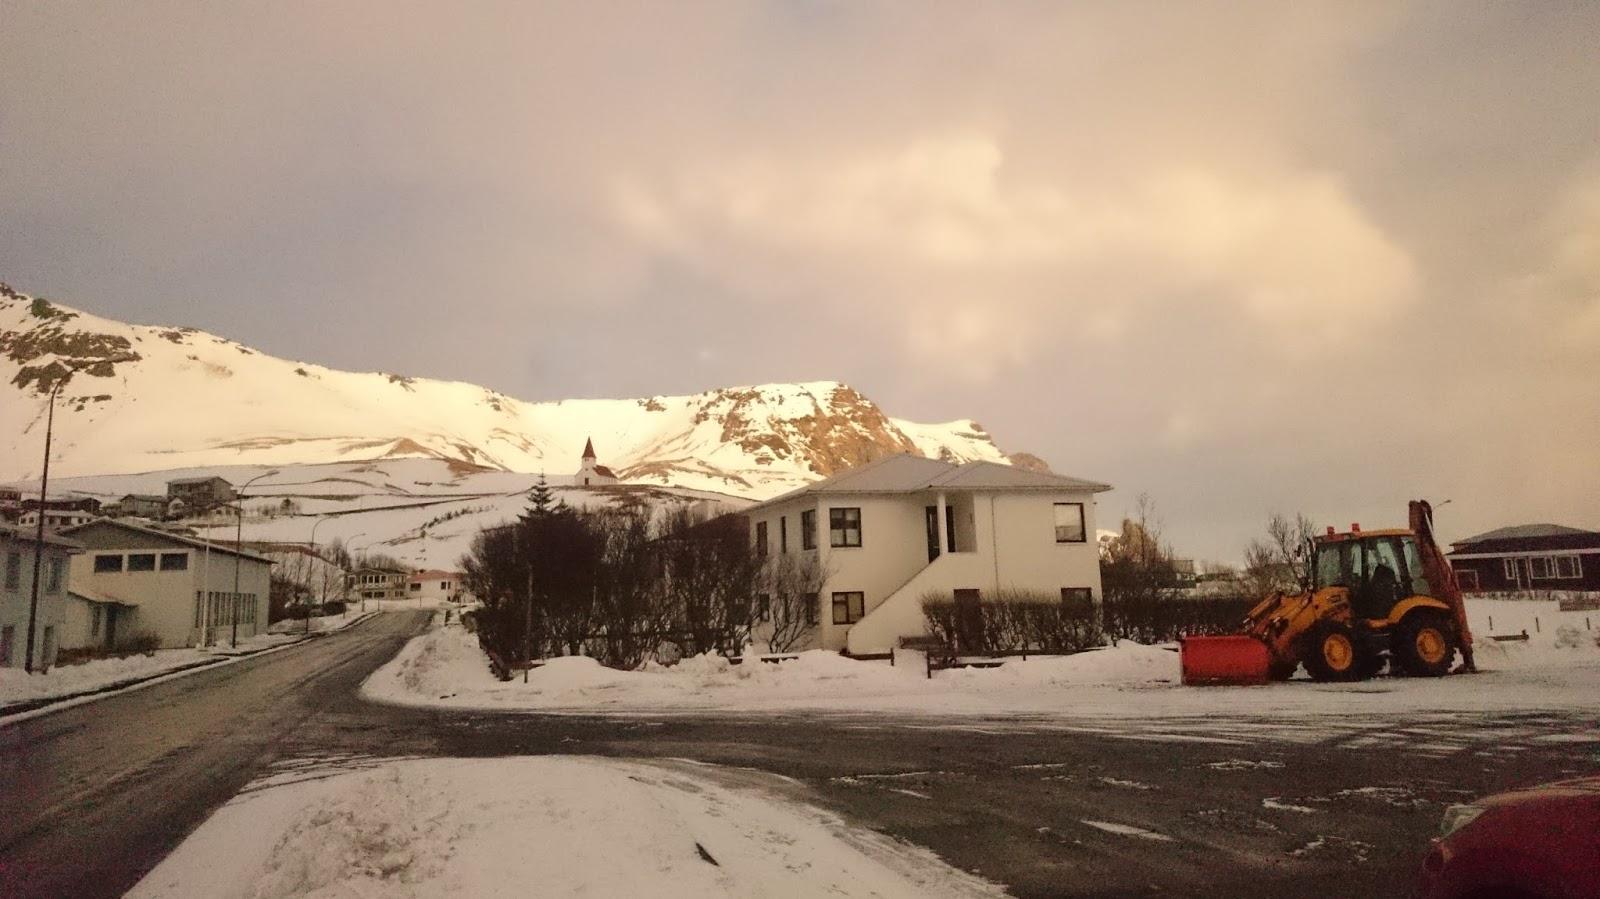 Vik, islandzka zima, zima, atrakcje Islandii, co zwiedzic w Islandii, zwiedzanie Islandii